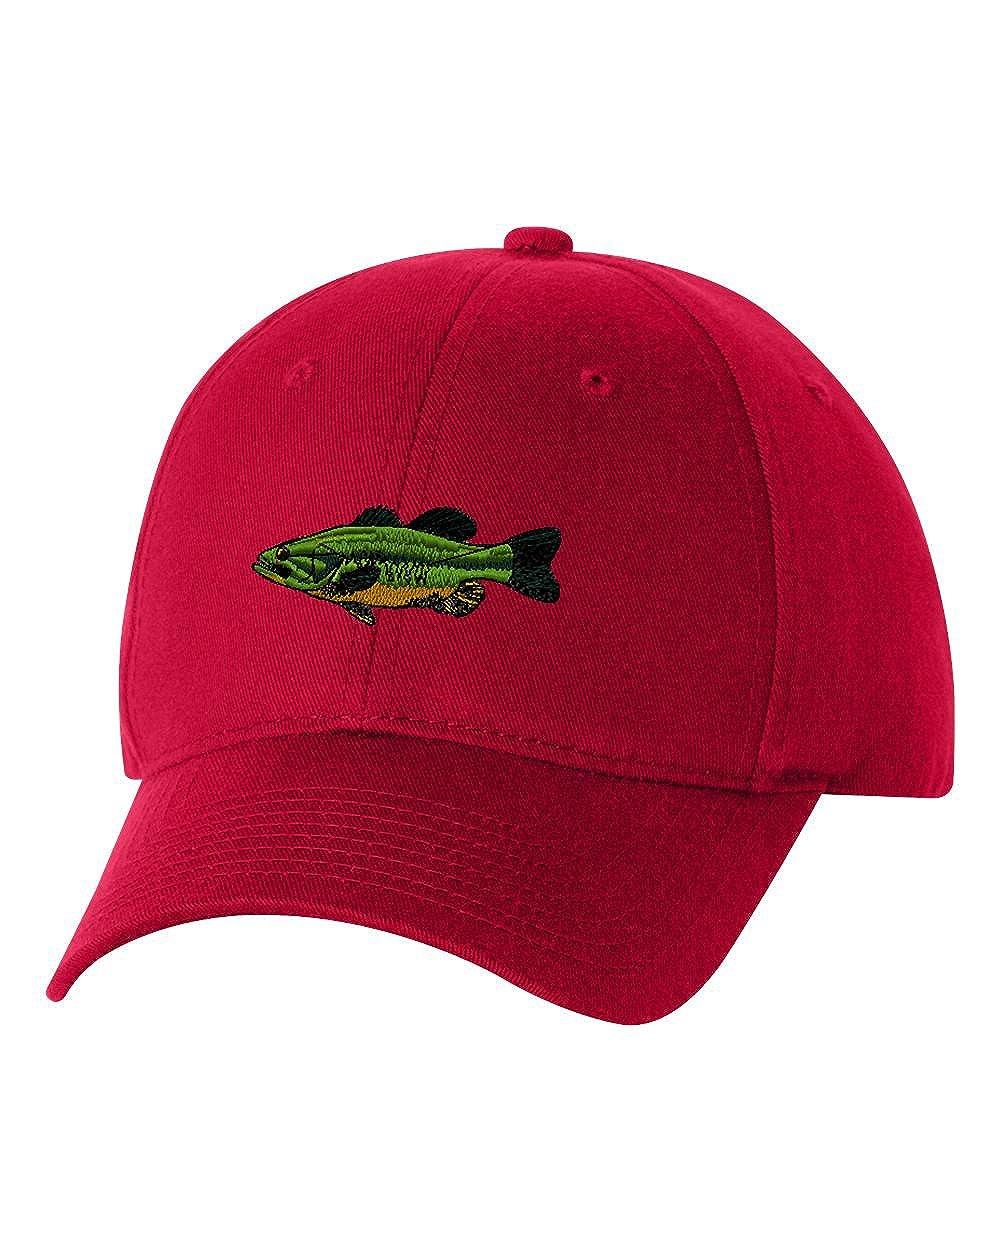 57787eae7c3 Amazon.com  Largemouth Bass Custom Personalized Embroidery Embroidered Hat  Baseball Cap  Clothing